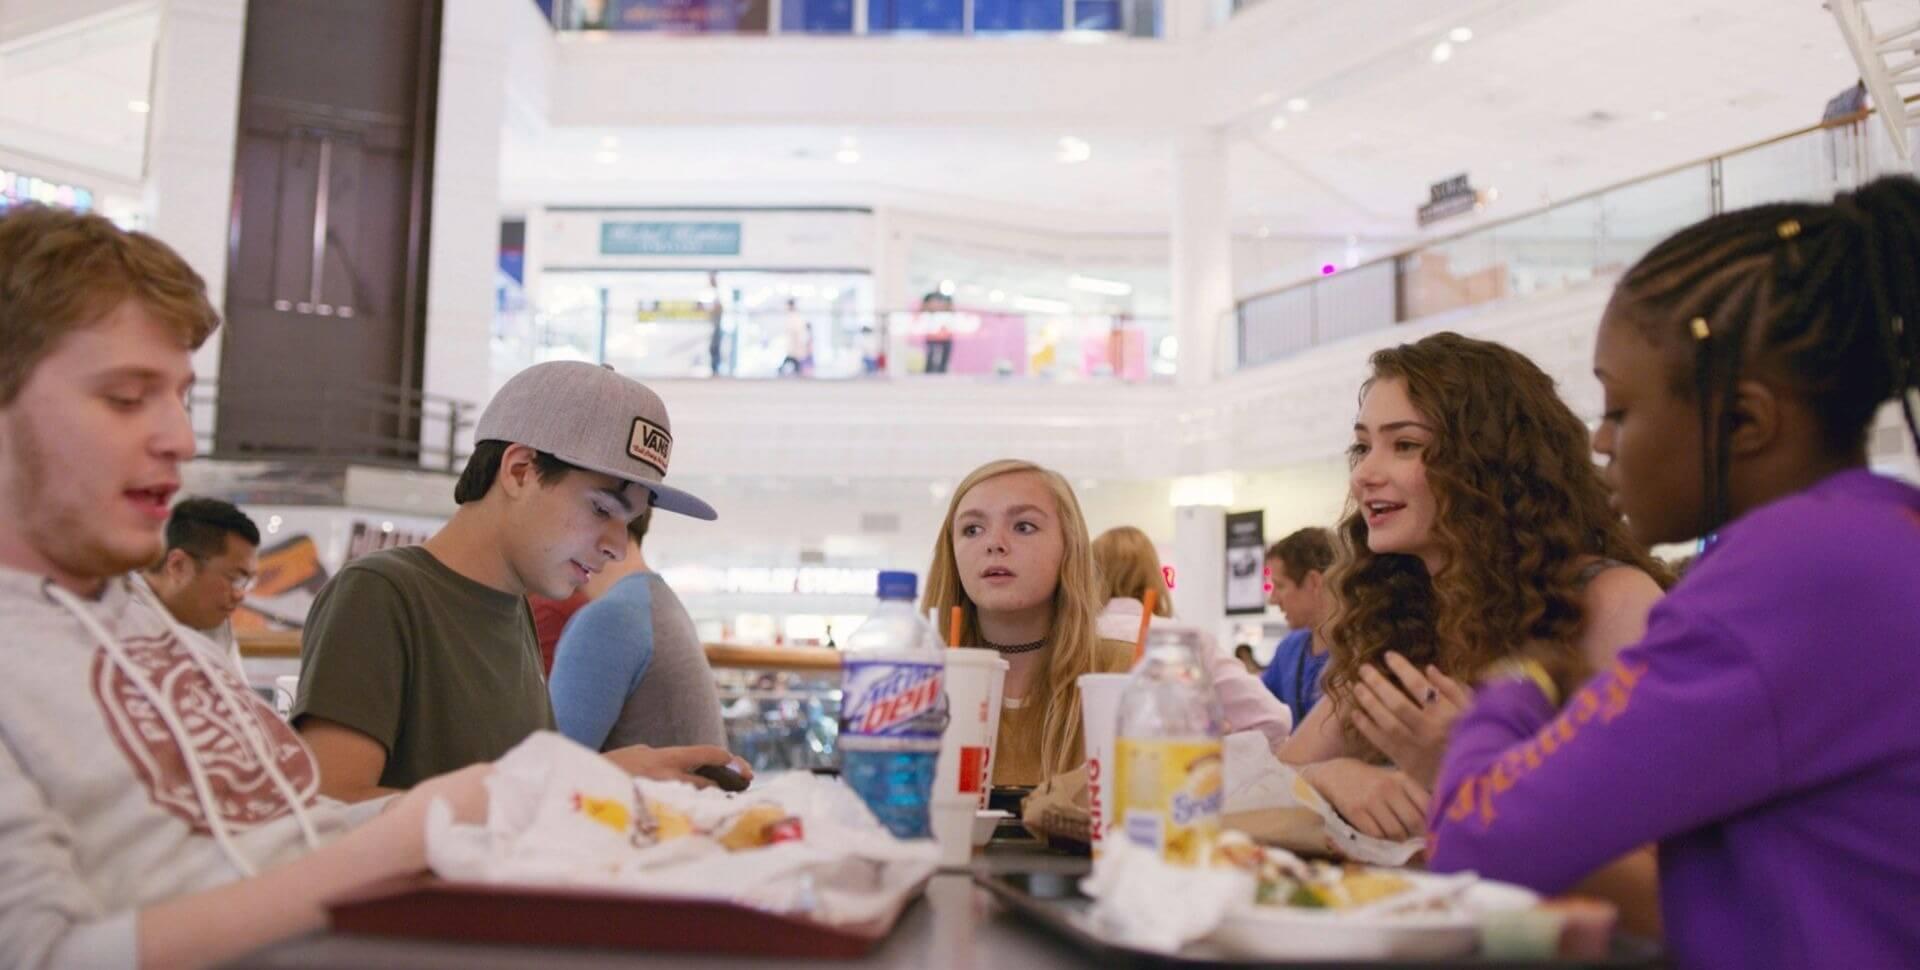 Eighth Grade 2018 Spoiler Free Movie Review